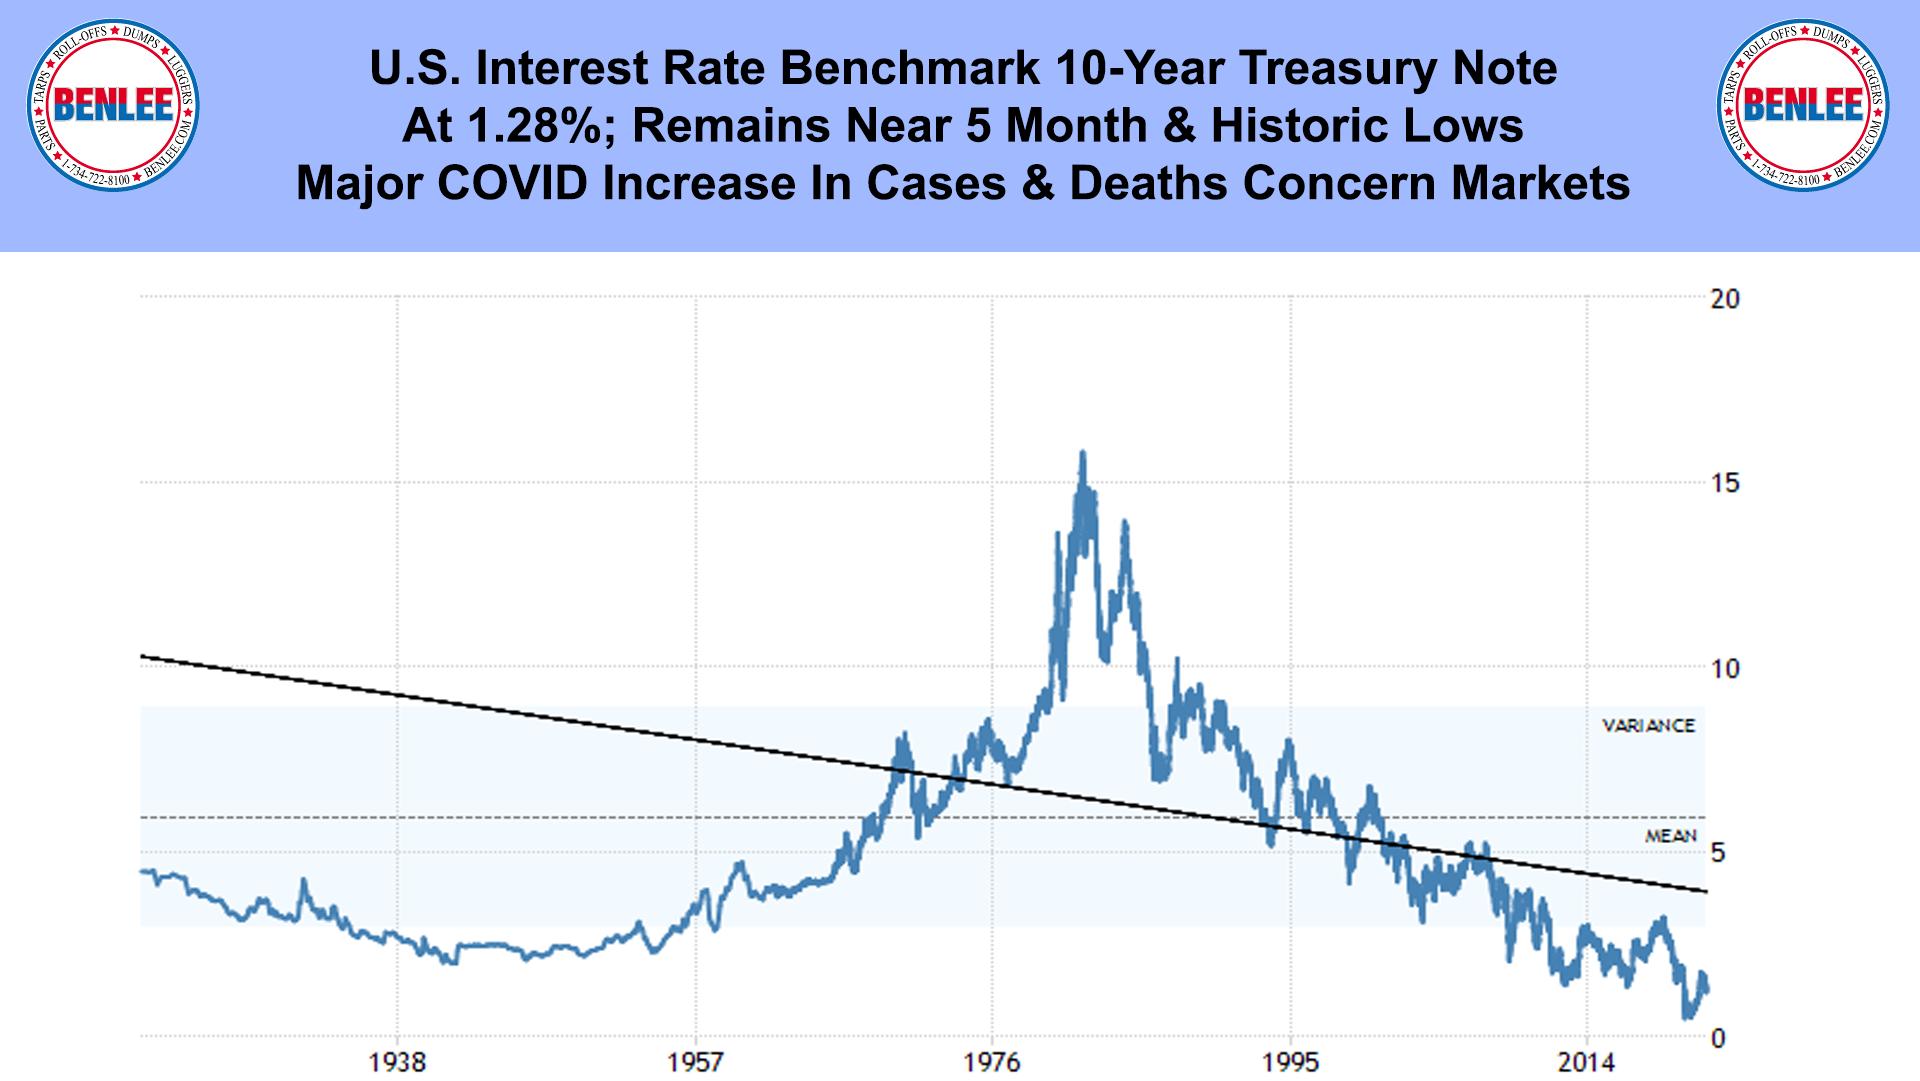 U.S. Interest Rate Benchmark 10-Year Treasury Note